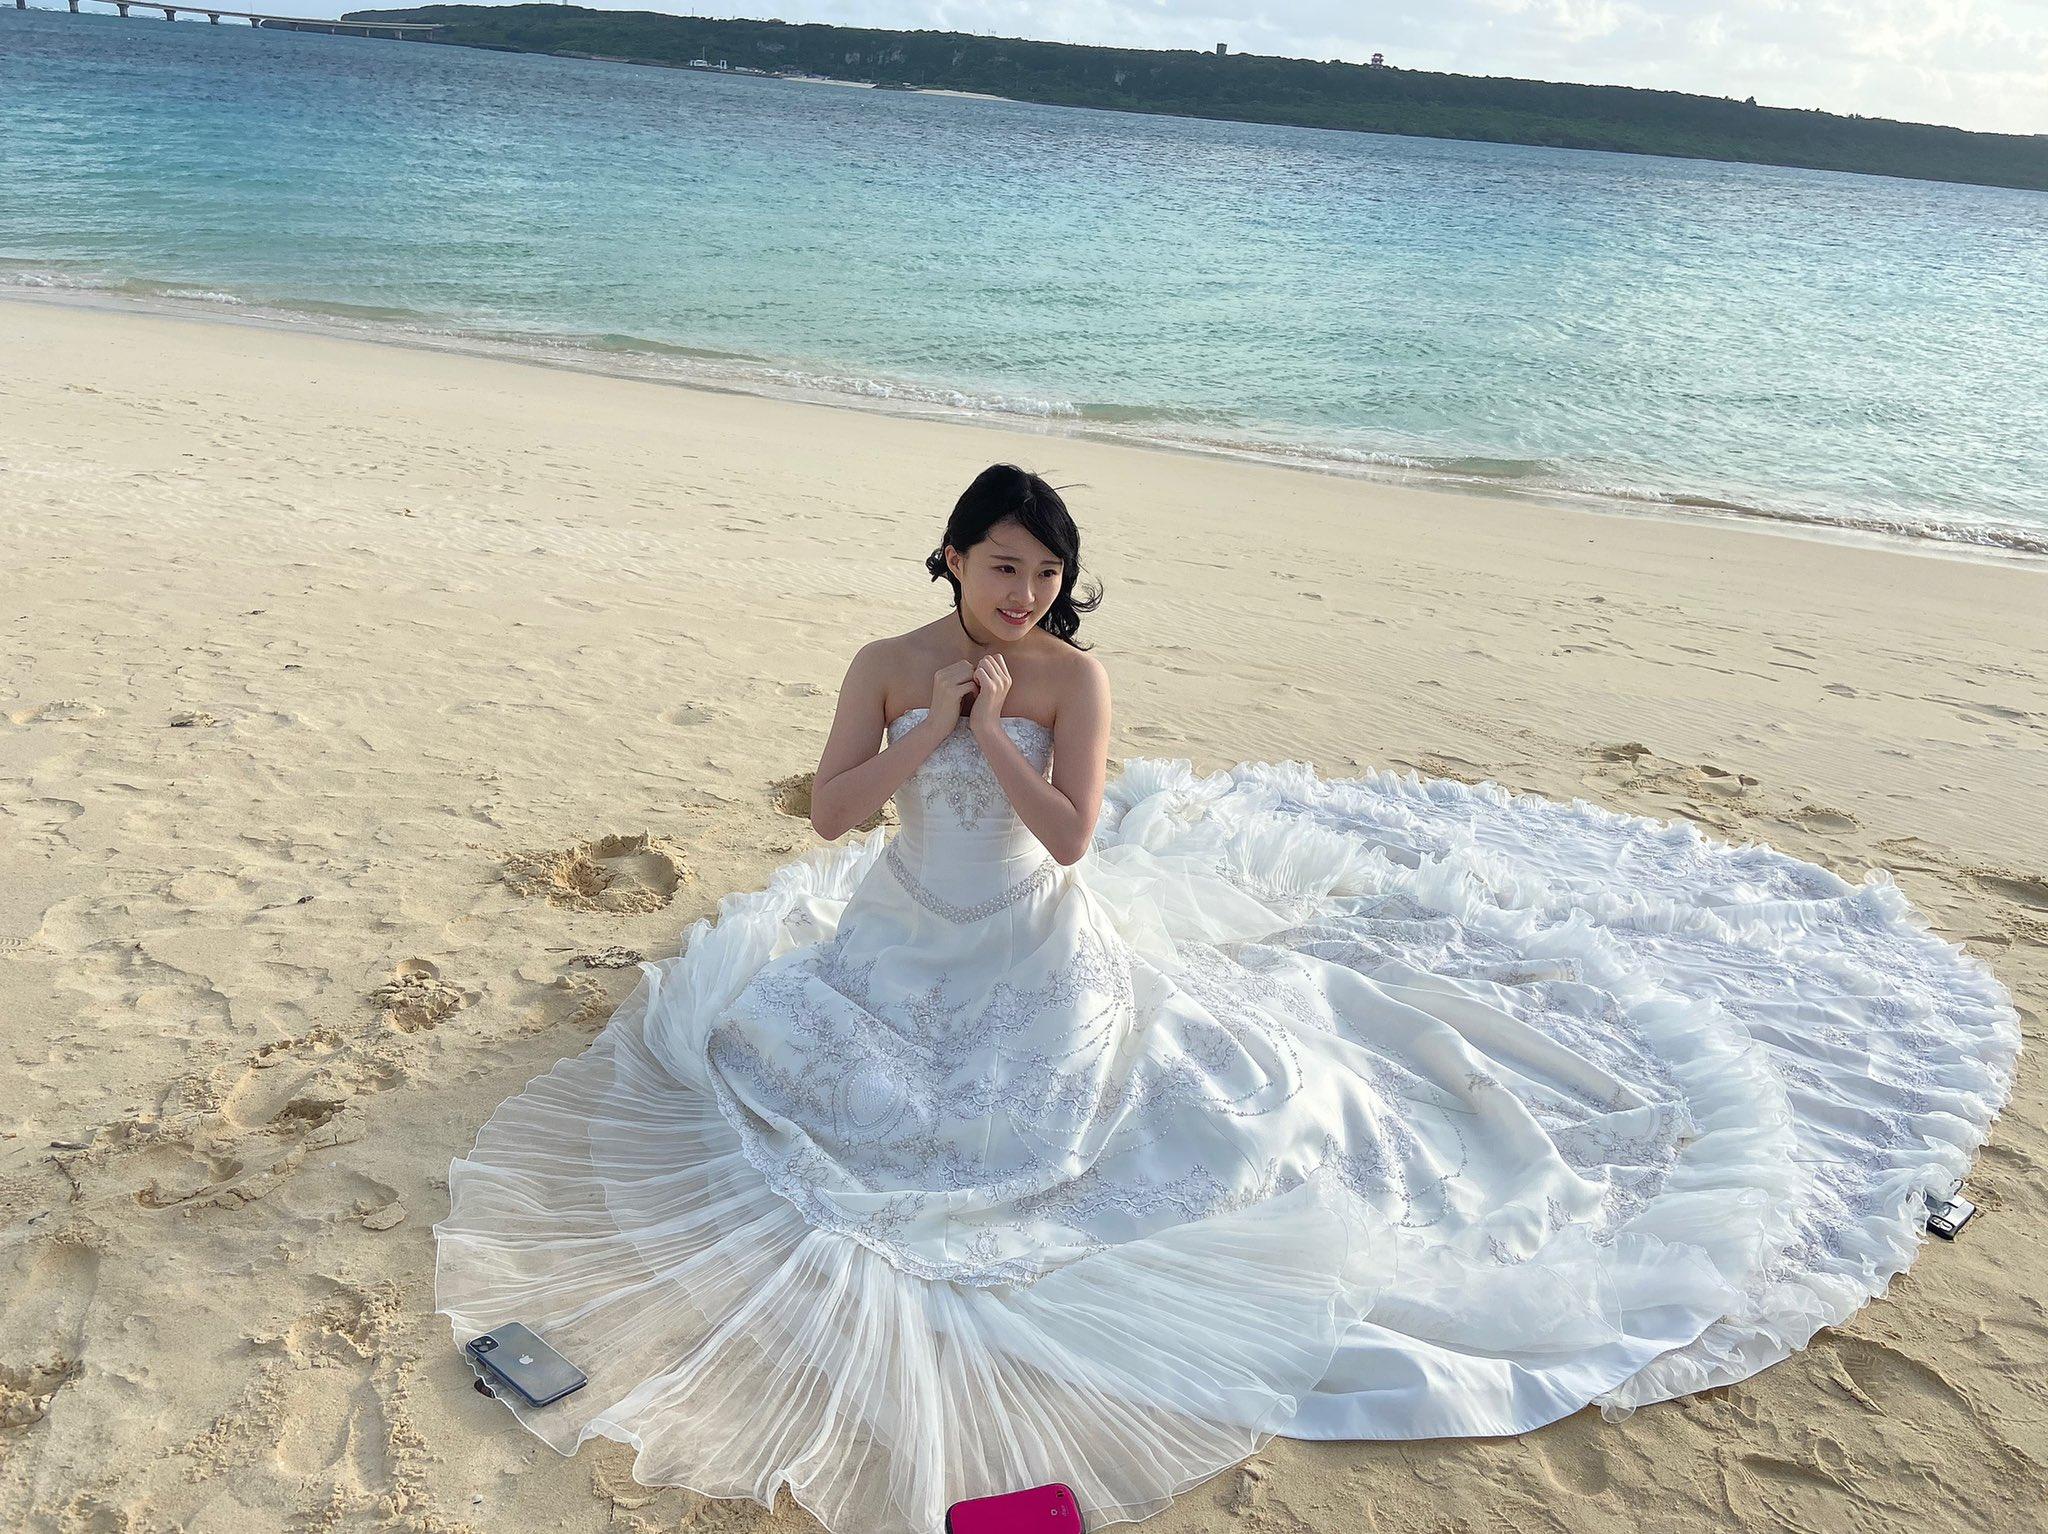 AKB48山根涼羽「ところで…結婚します?」ウエディングドレス姿の撮影オフショットで美デコルテ【画像4枚】の画像004